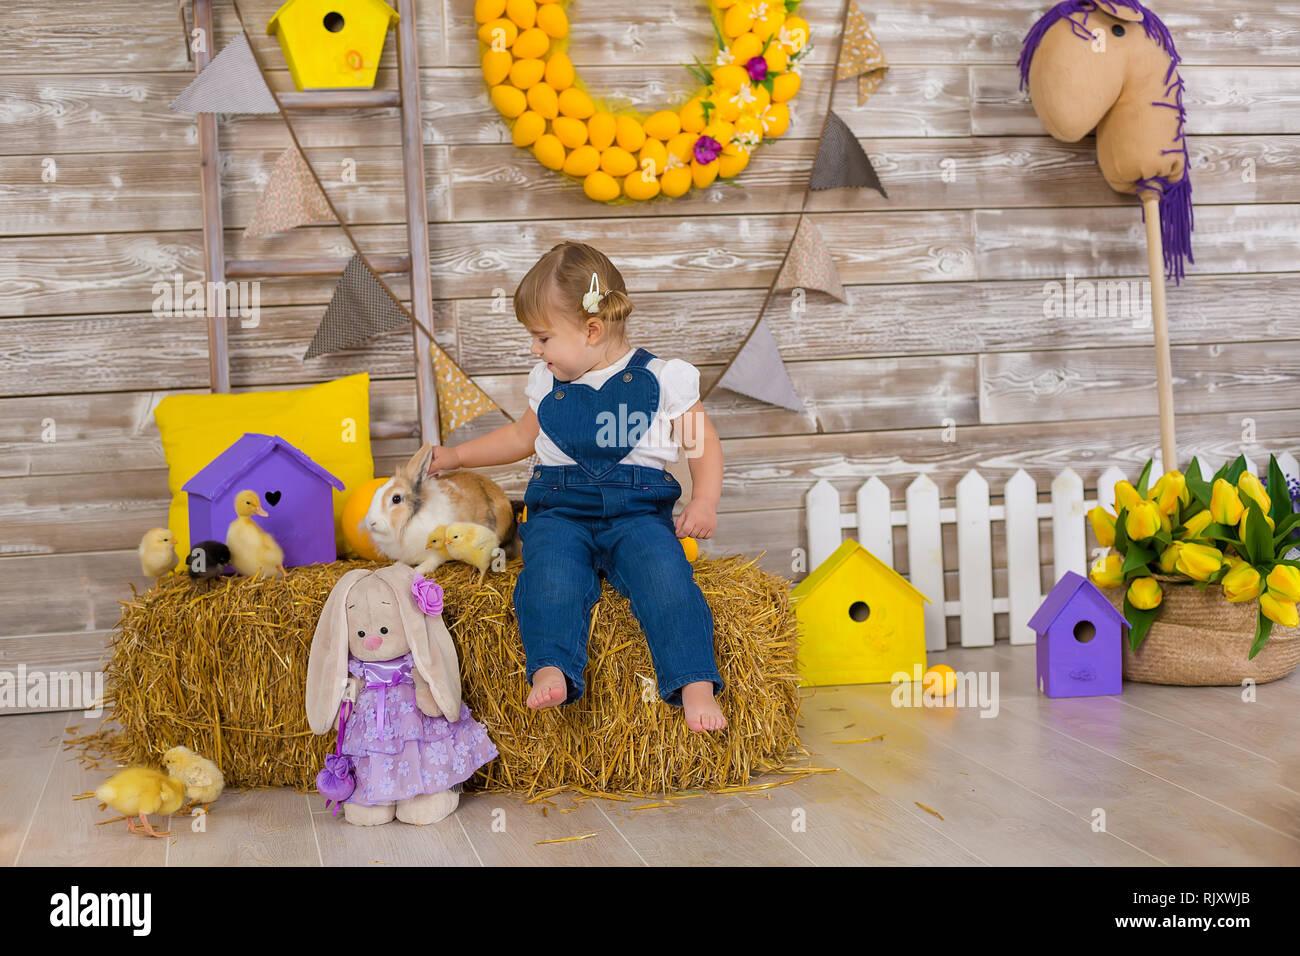 Hide Seek Kids: Young Girl Happy Playing Hide And Seek Stock Photos